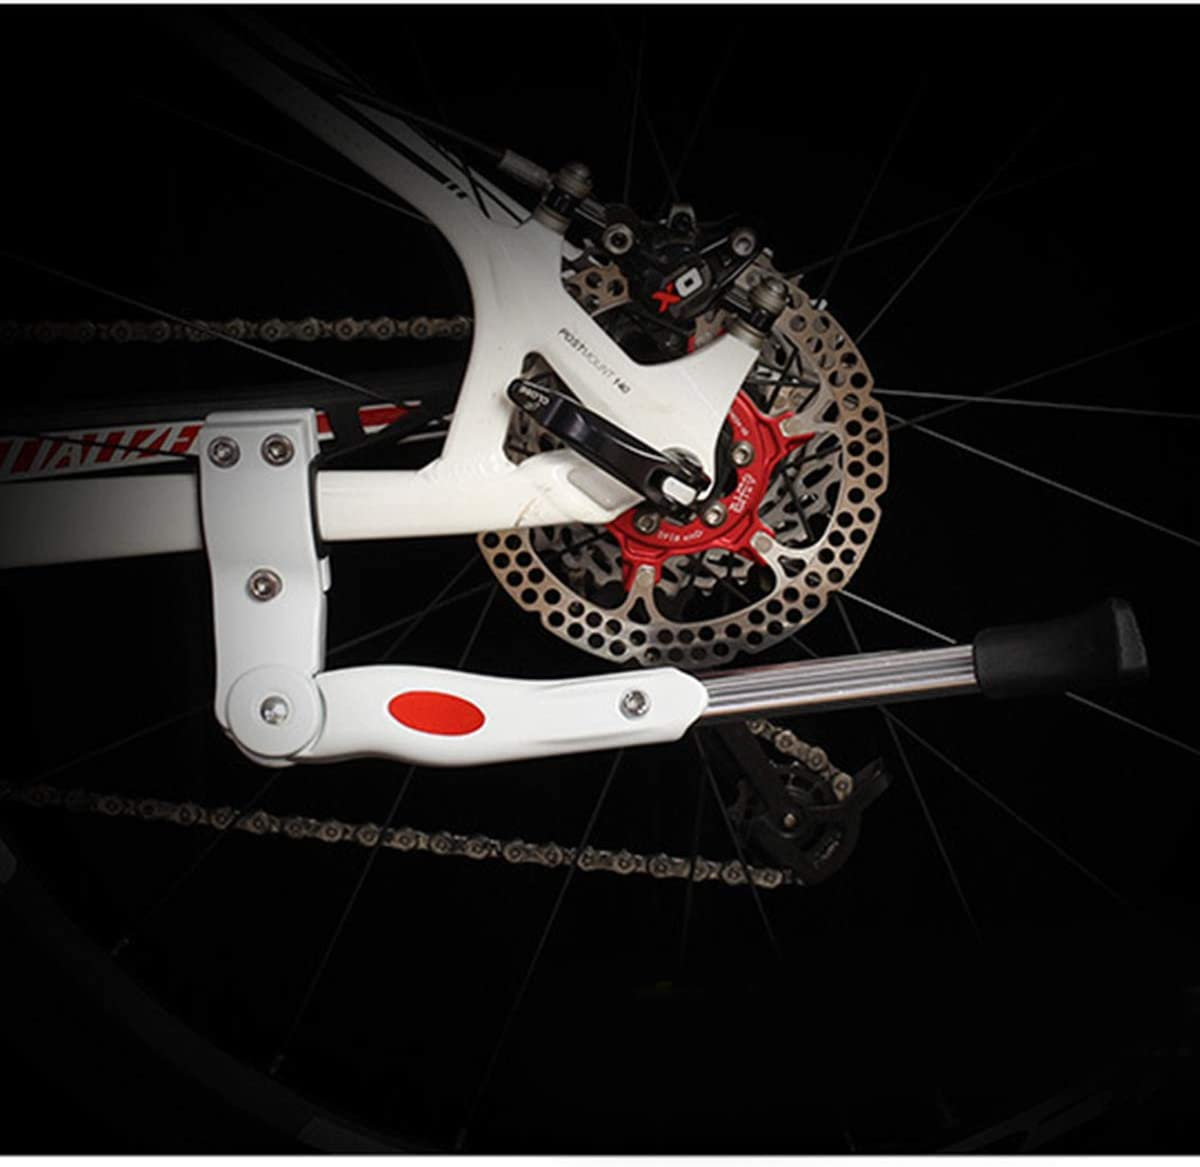 dancepandas Bike Stand Rear Wheel 2PCS Black White Bicycle Kickstand Adjustable Alloy Bike Prop Stand for 24-29 Inch Bicycles